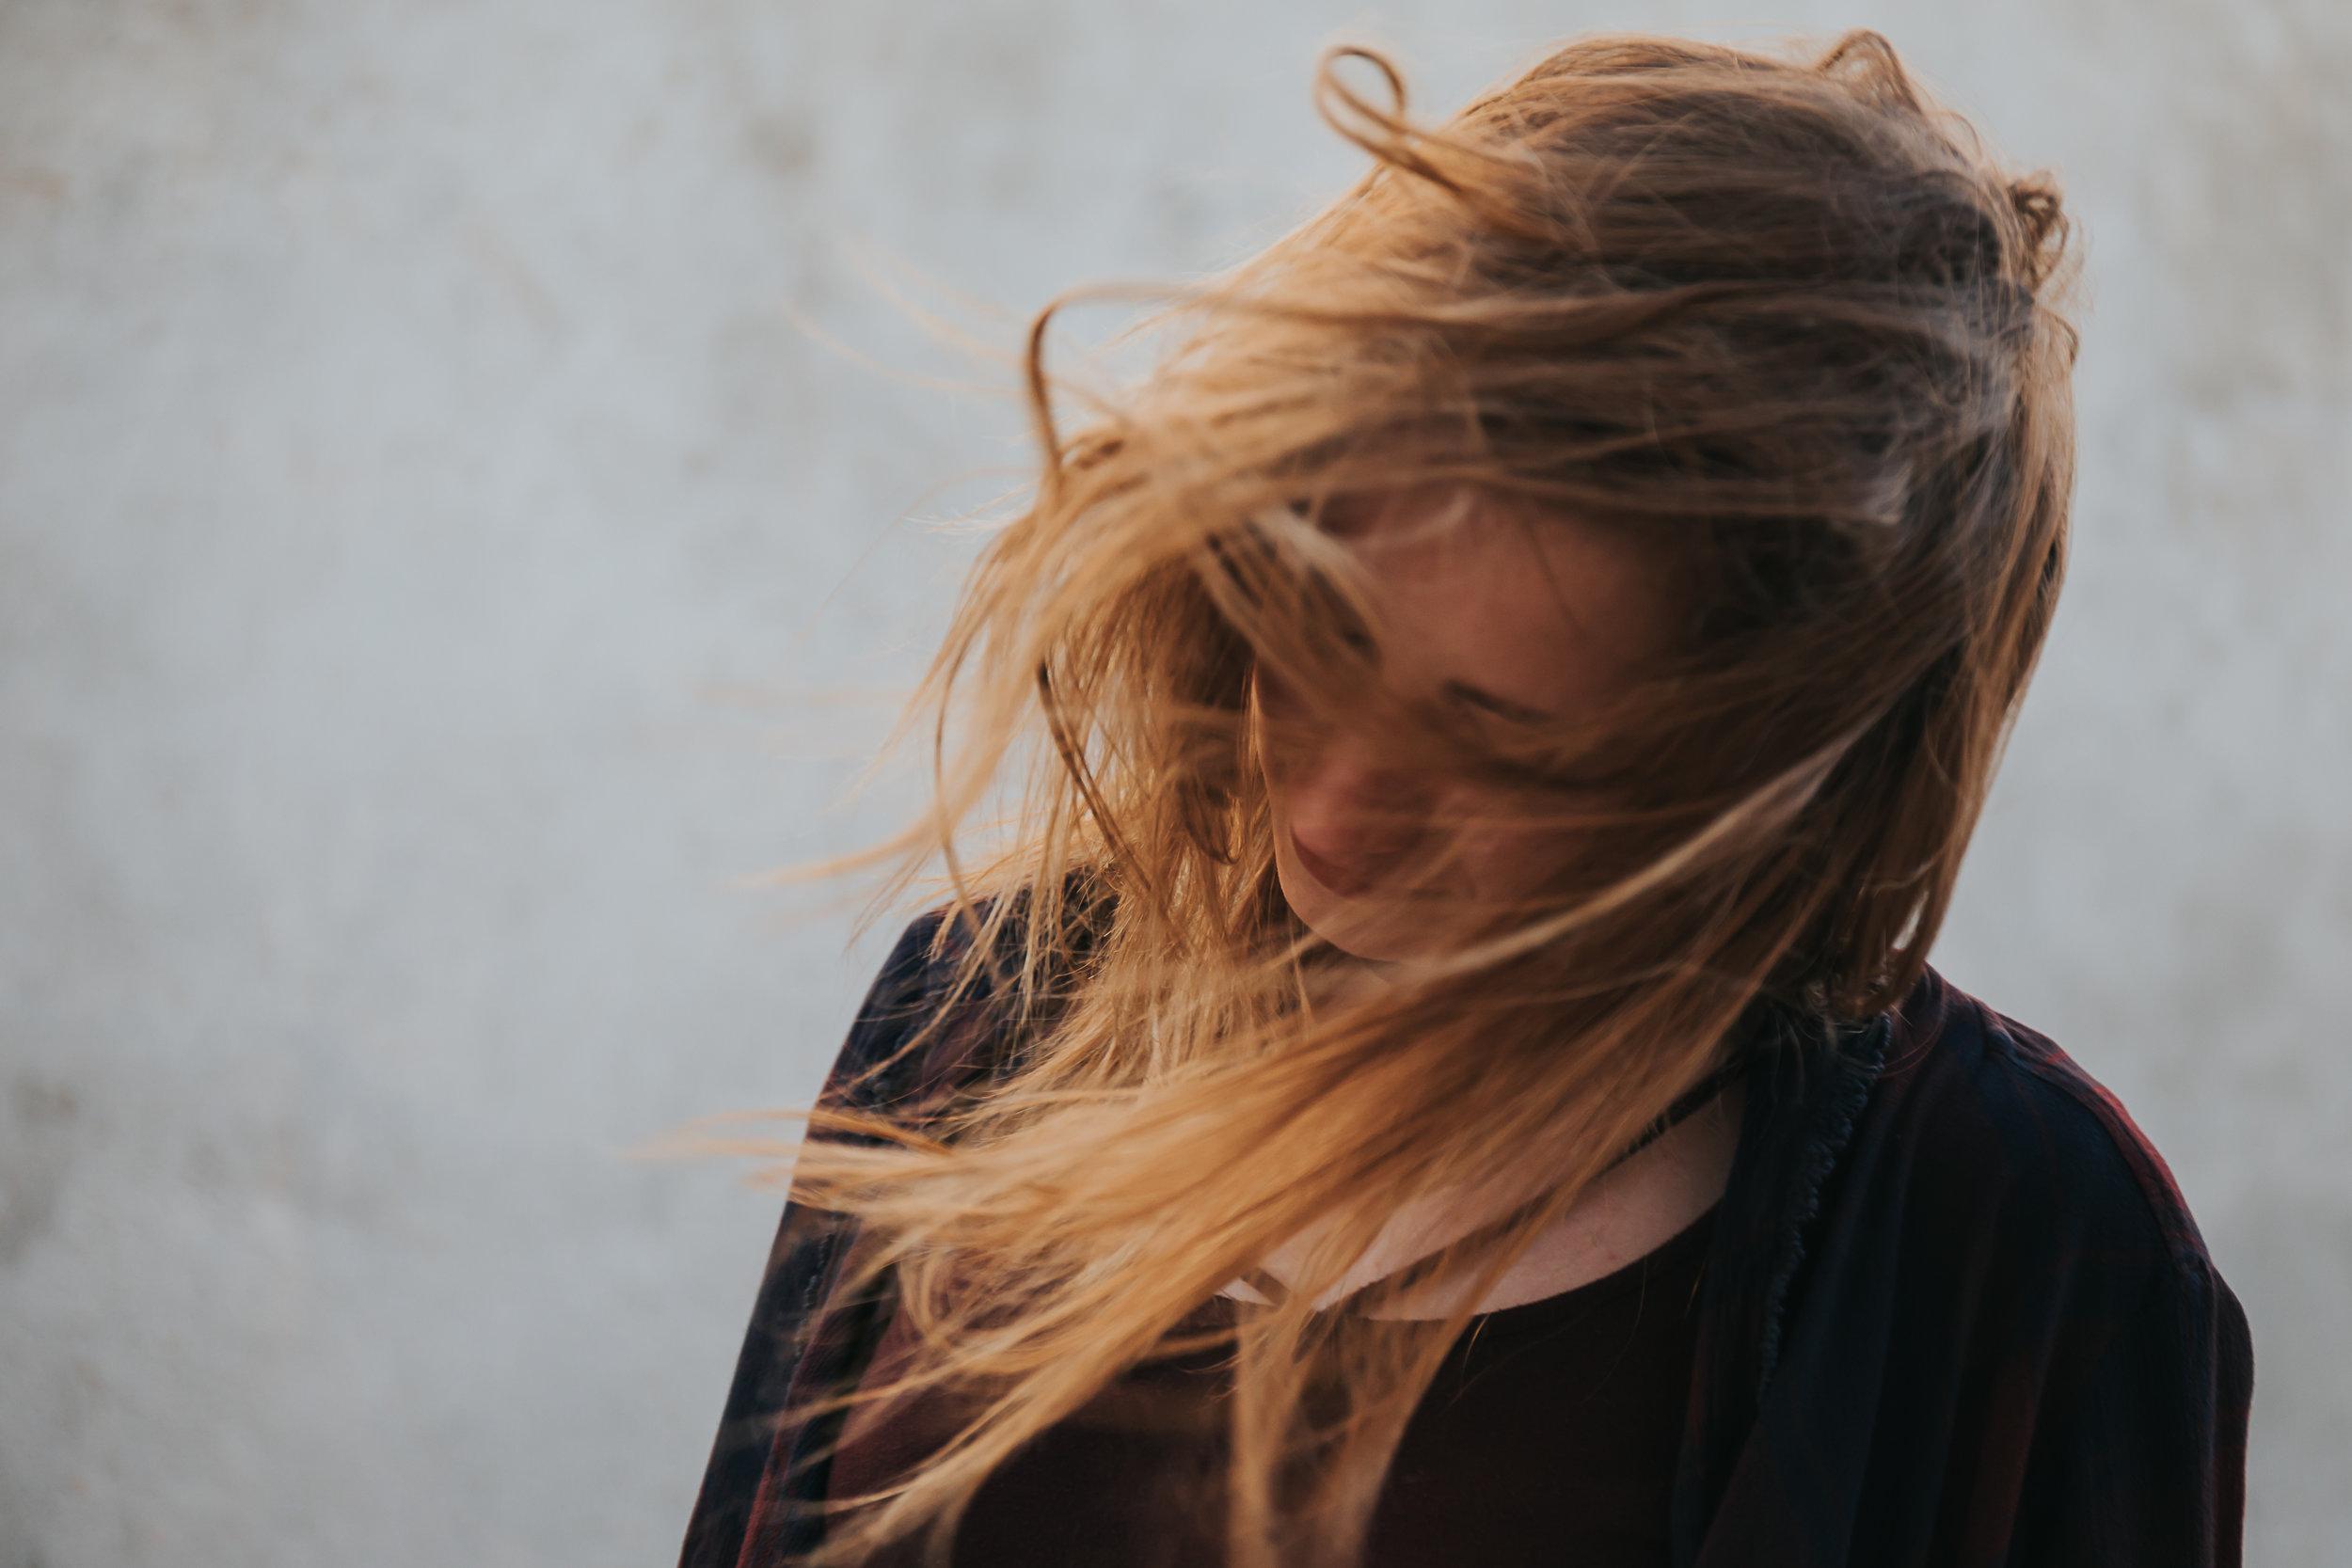 Teen girl's hair blows wildly in the wind. © Merry Ohler Creative, 2019. Photo by Merry Ohler, wedding photographer Kansas City.